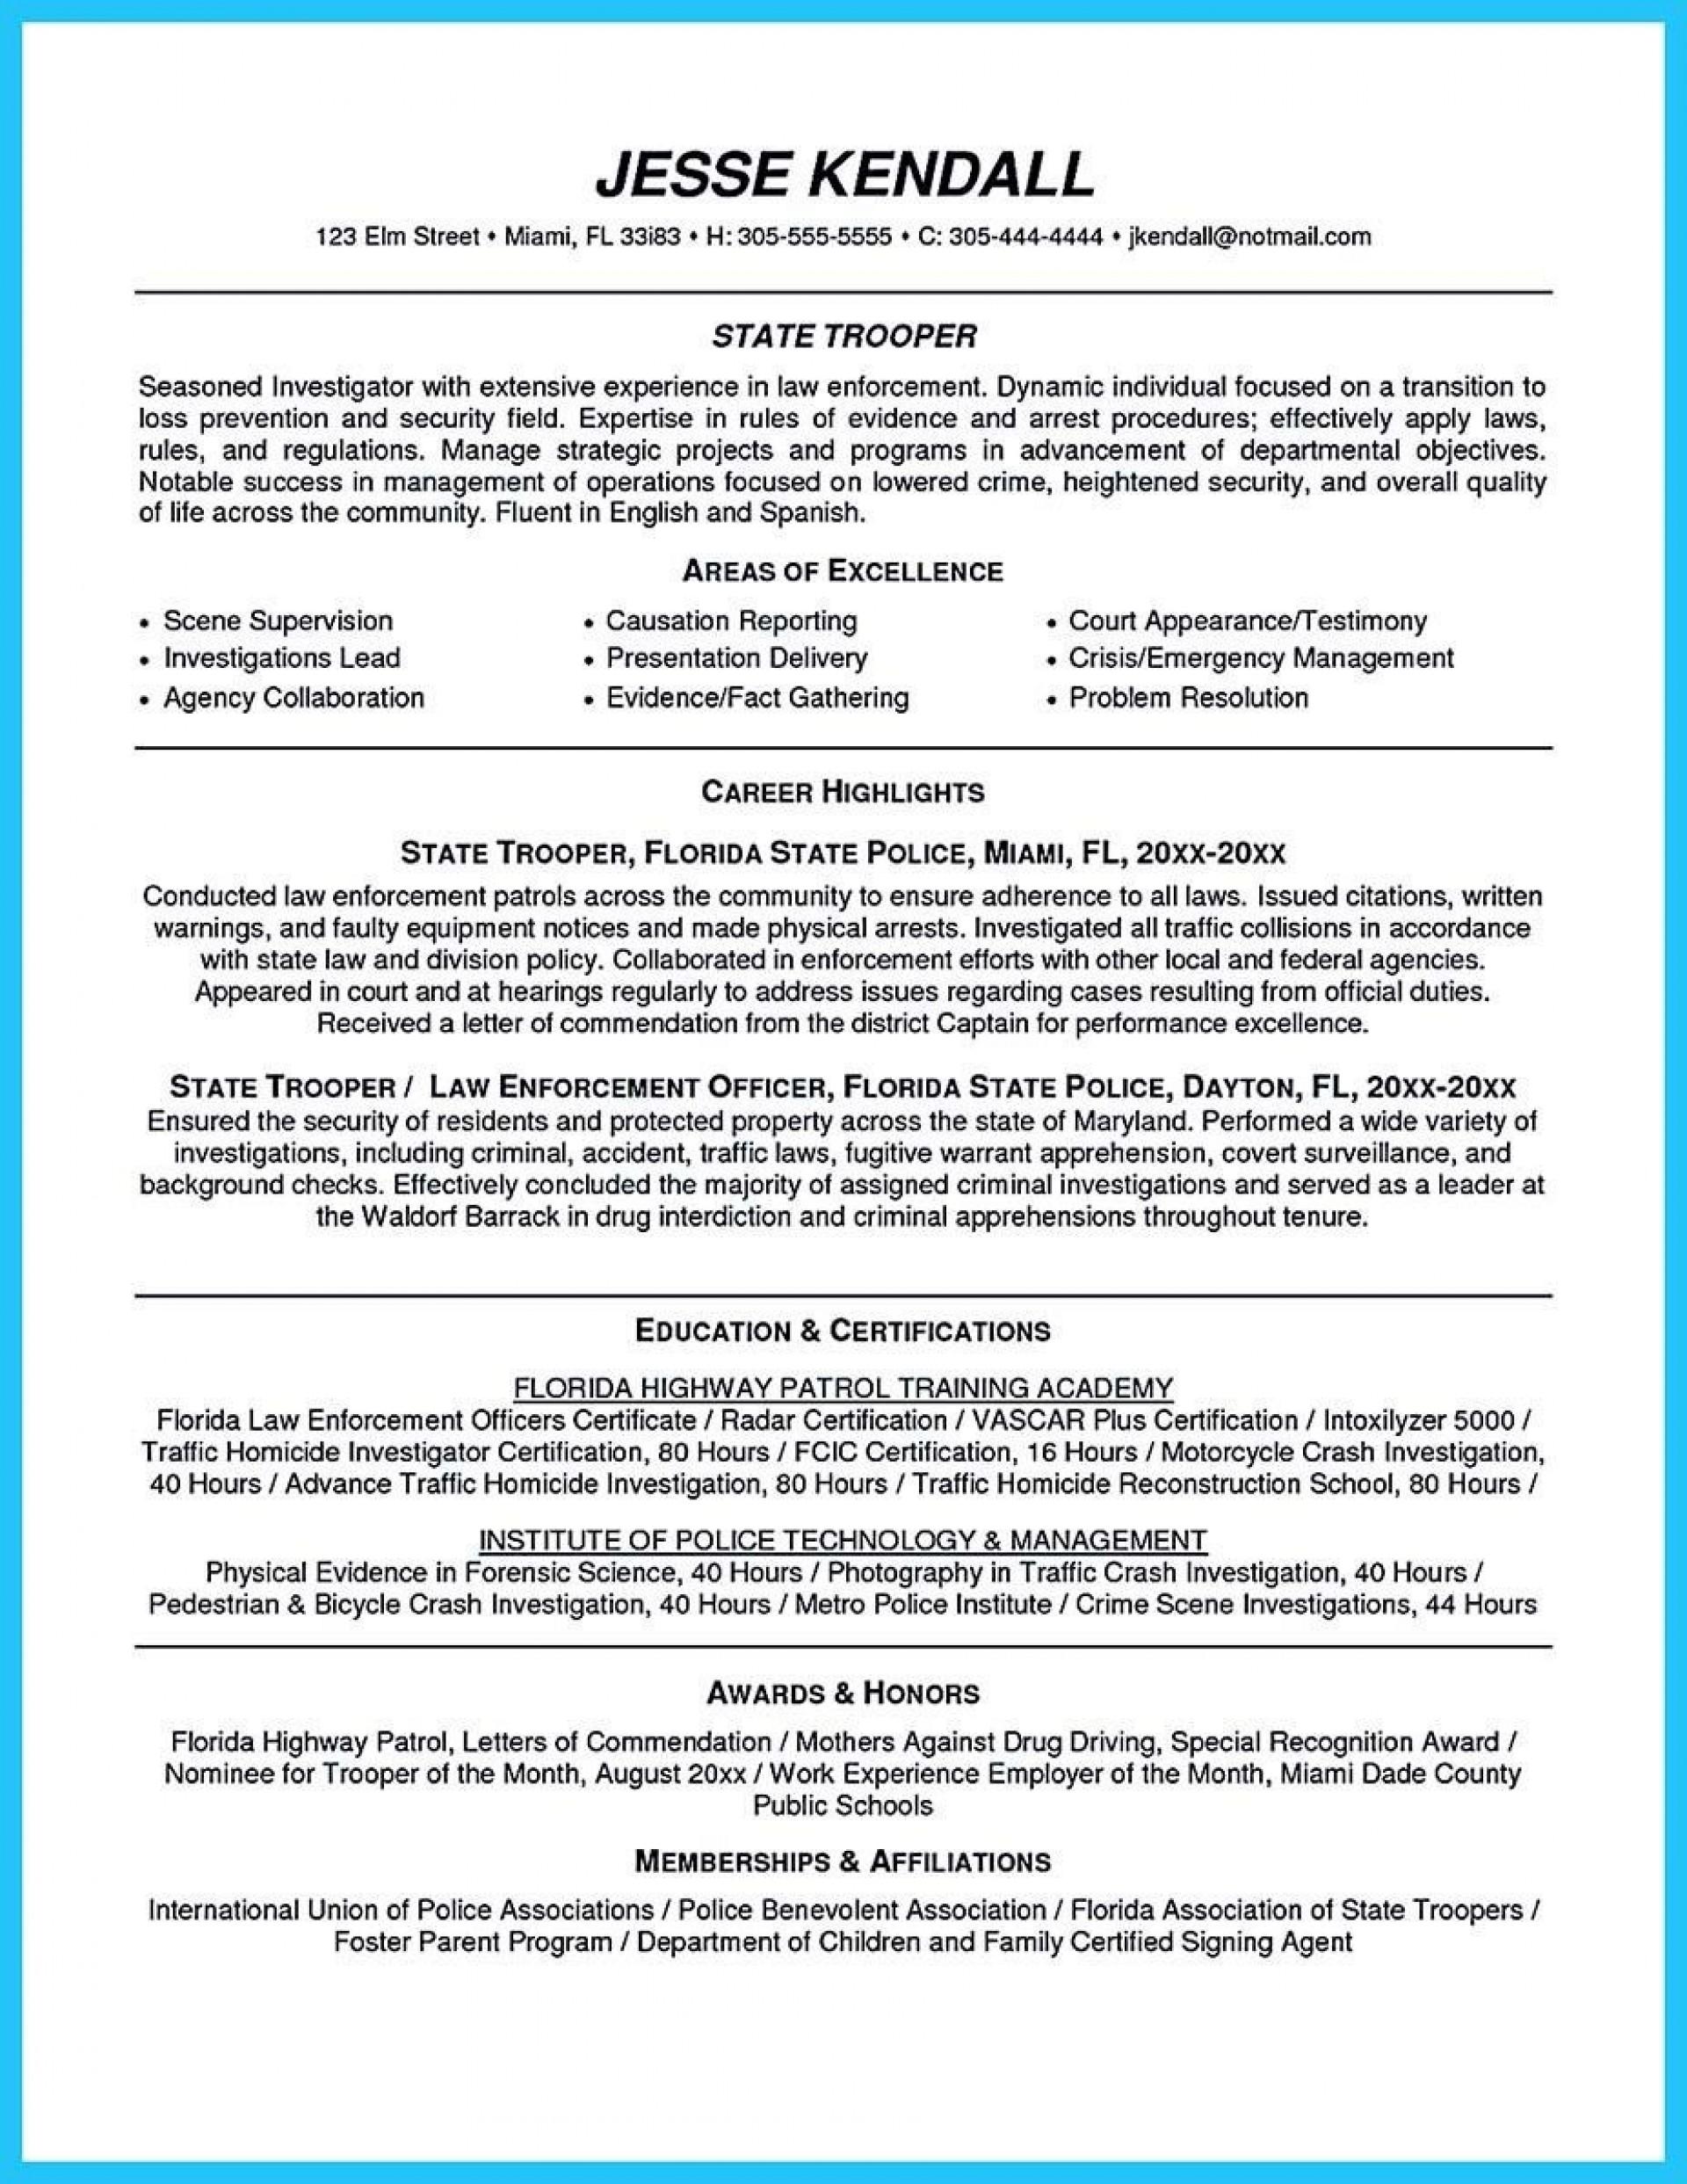 003 Impressive Law Enforcement Resume Template Sample  Microsoft Word Federal1920